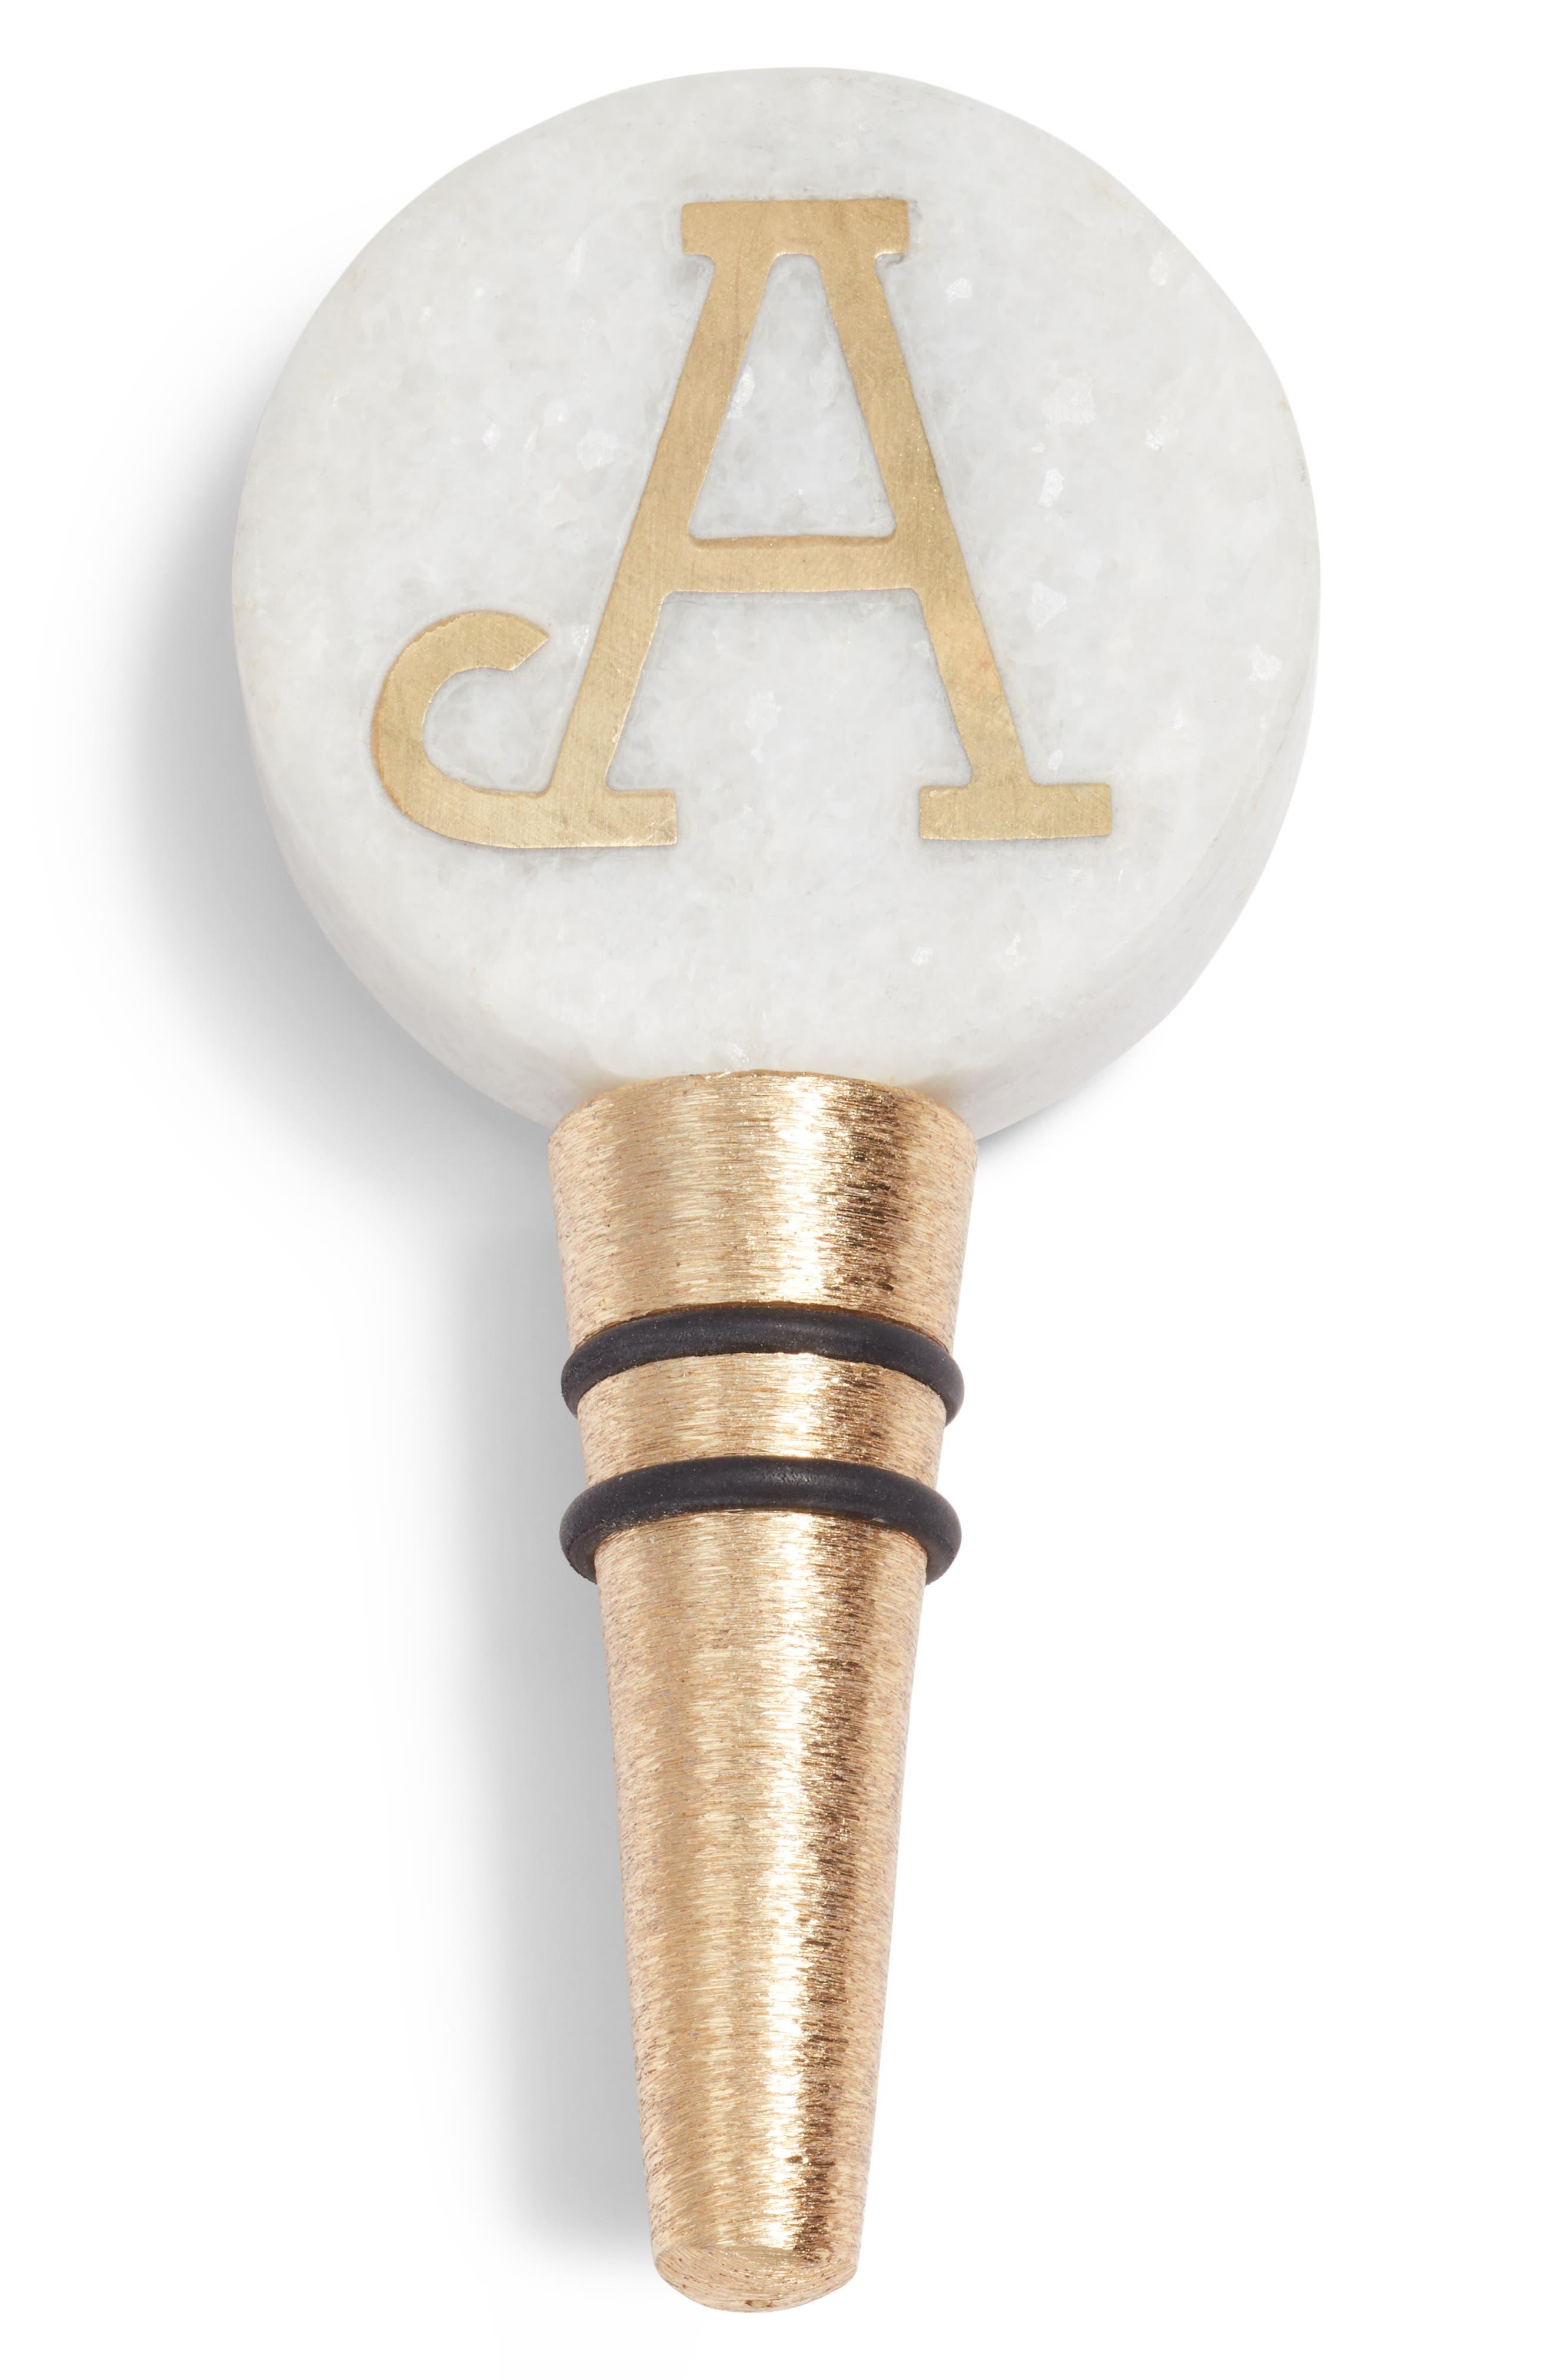 Monogram Marble Bottle Stopper,                         Main,                         color, WHITE/ GOLD A